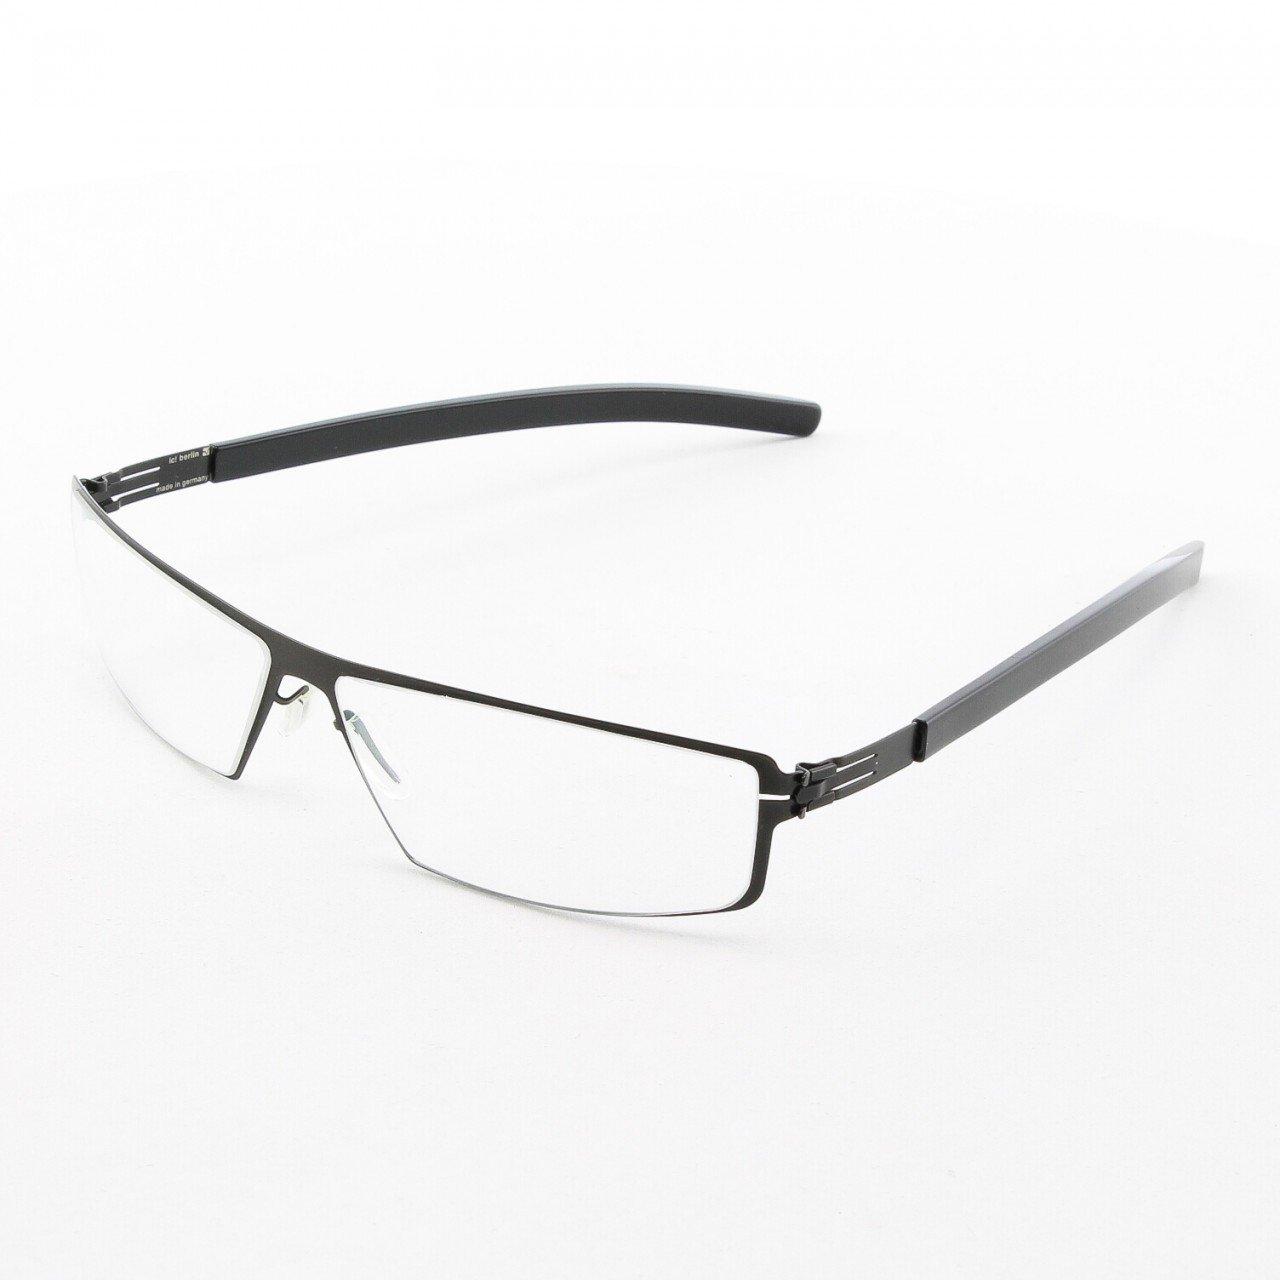 ic! Berlin Hornberg Eyeglasses Col. Black with Clear Lenses